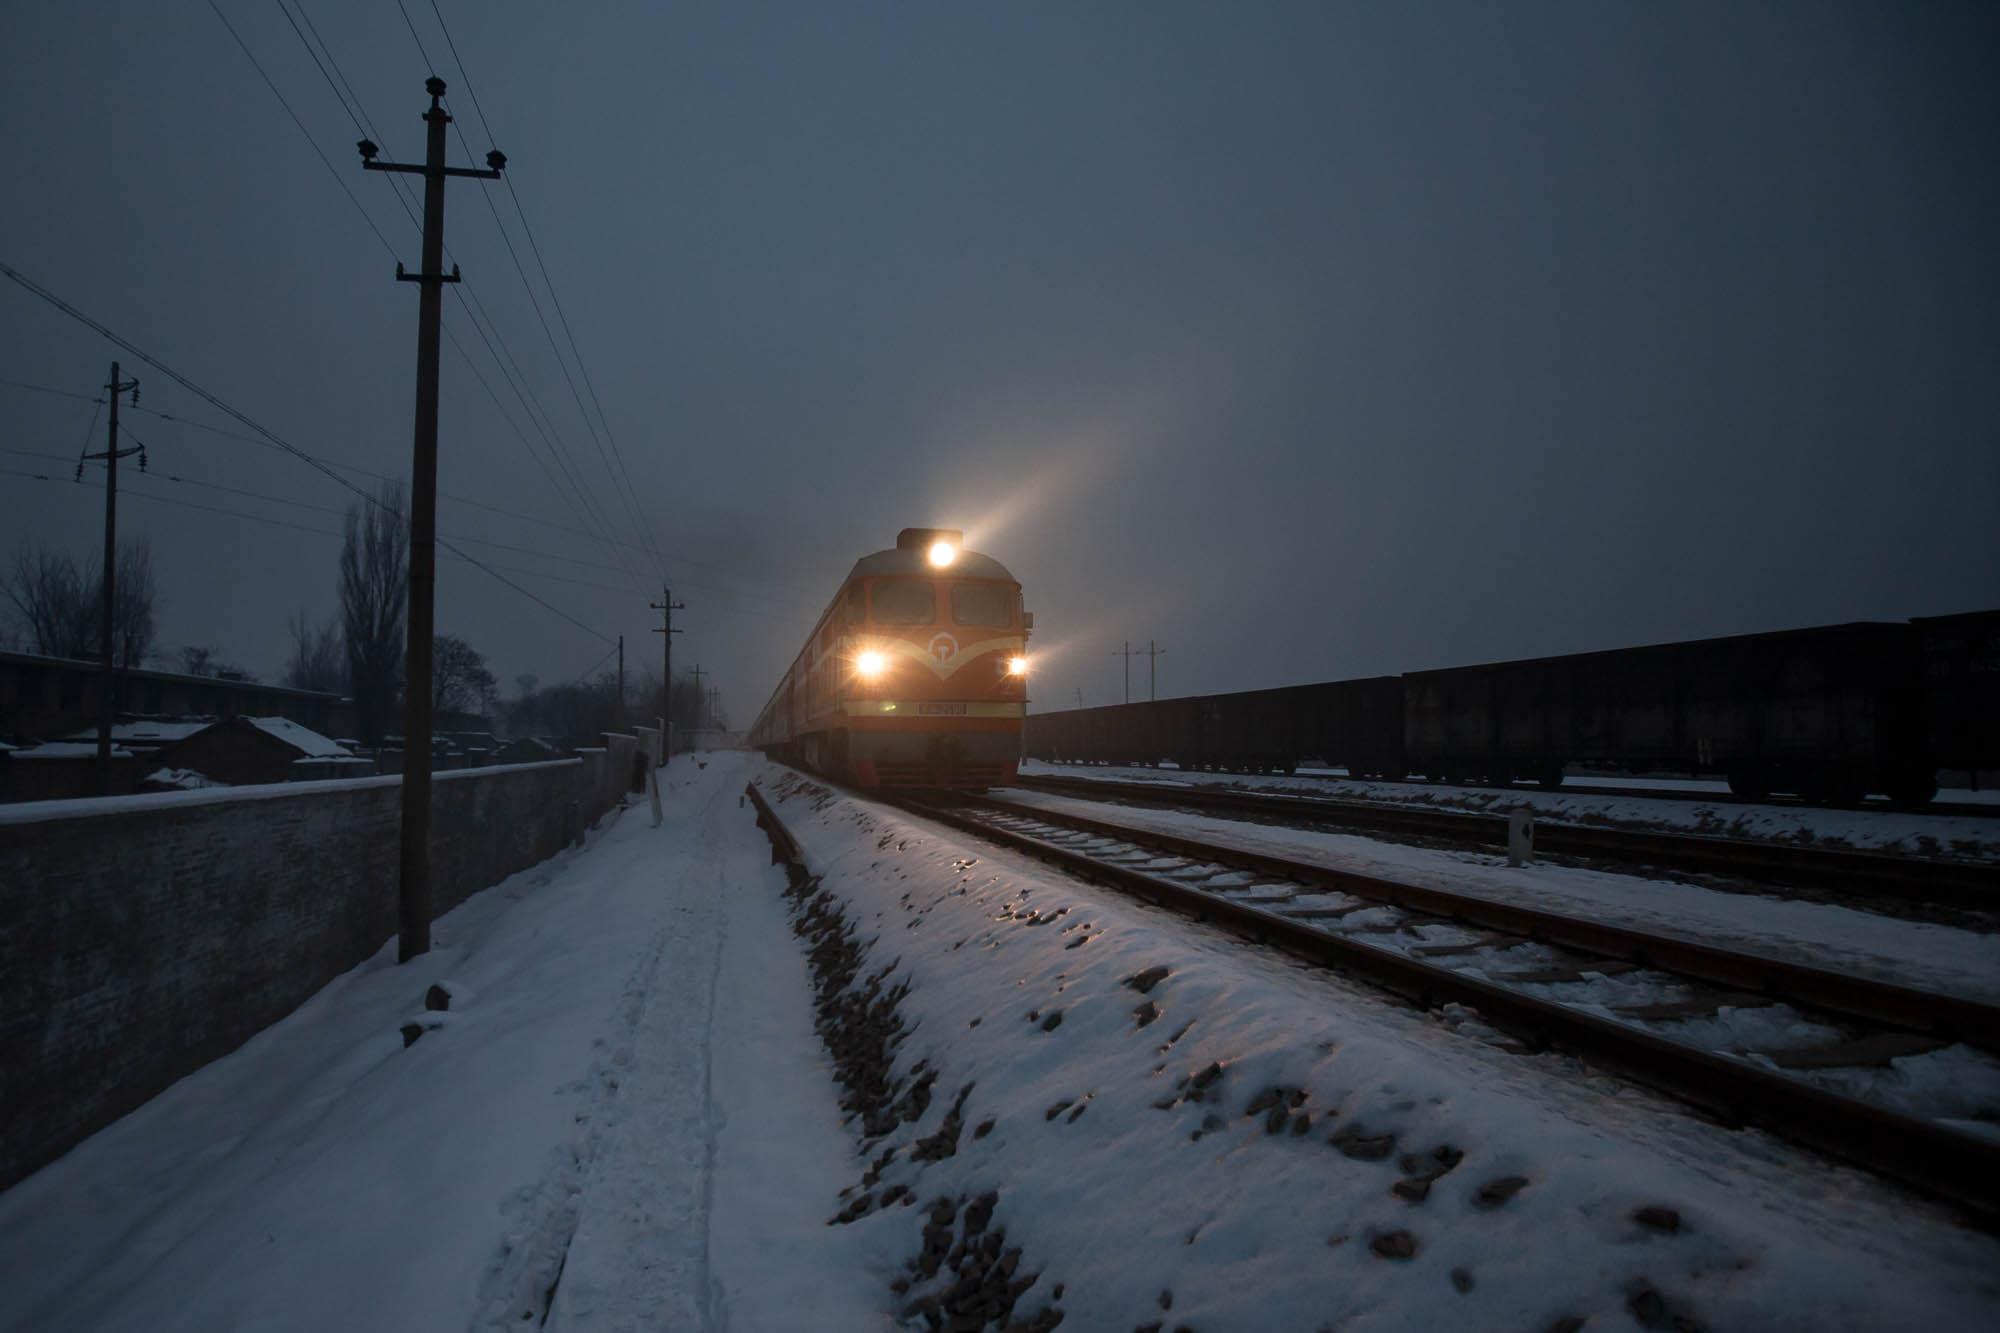 train passing at night